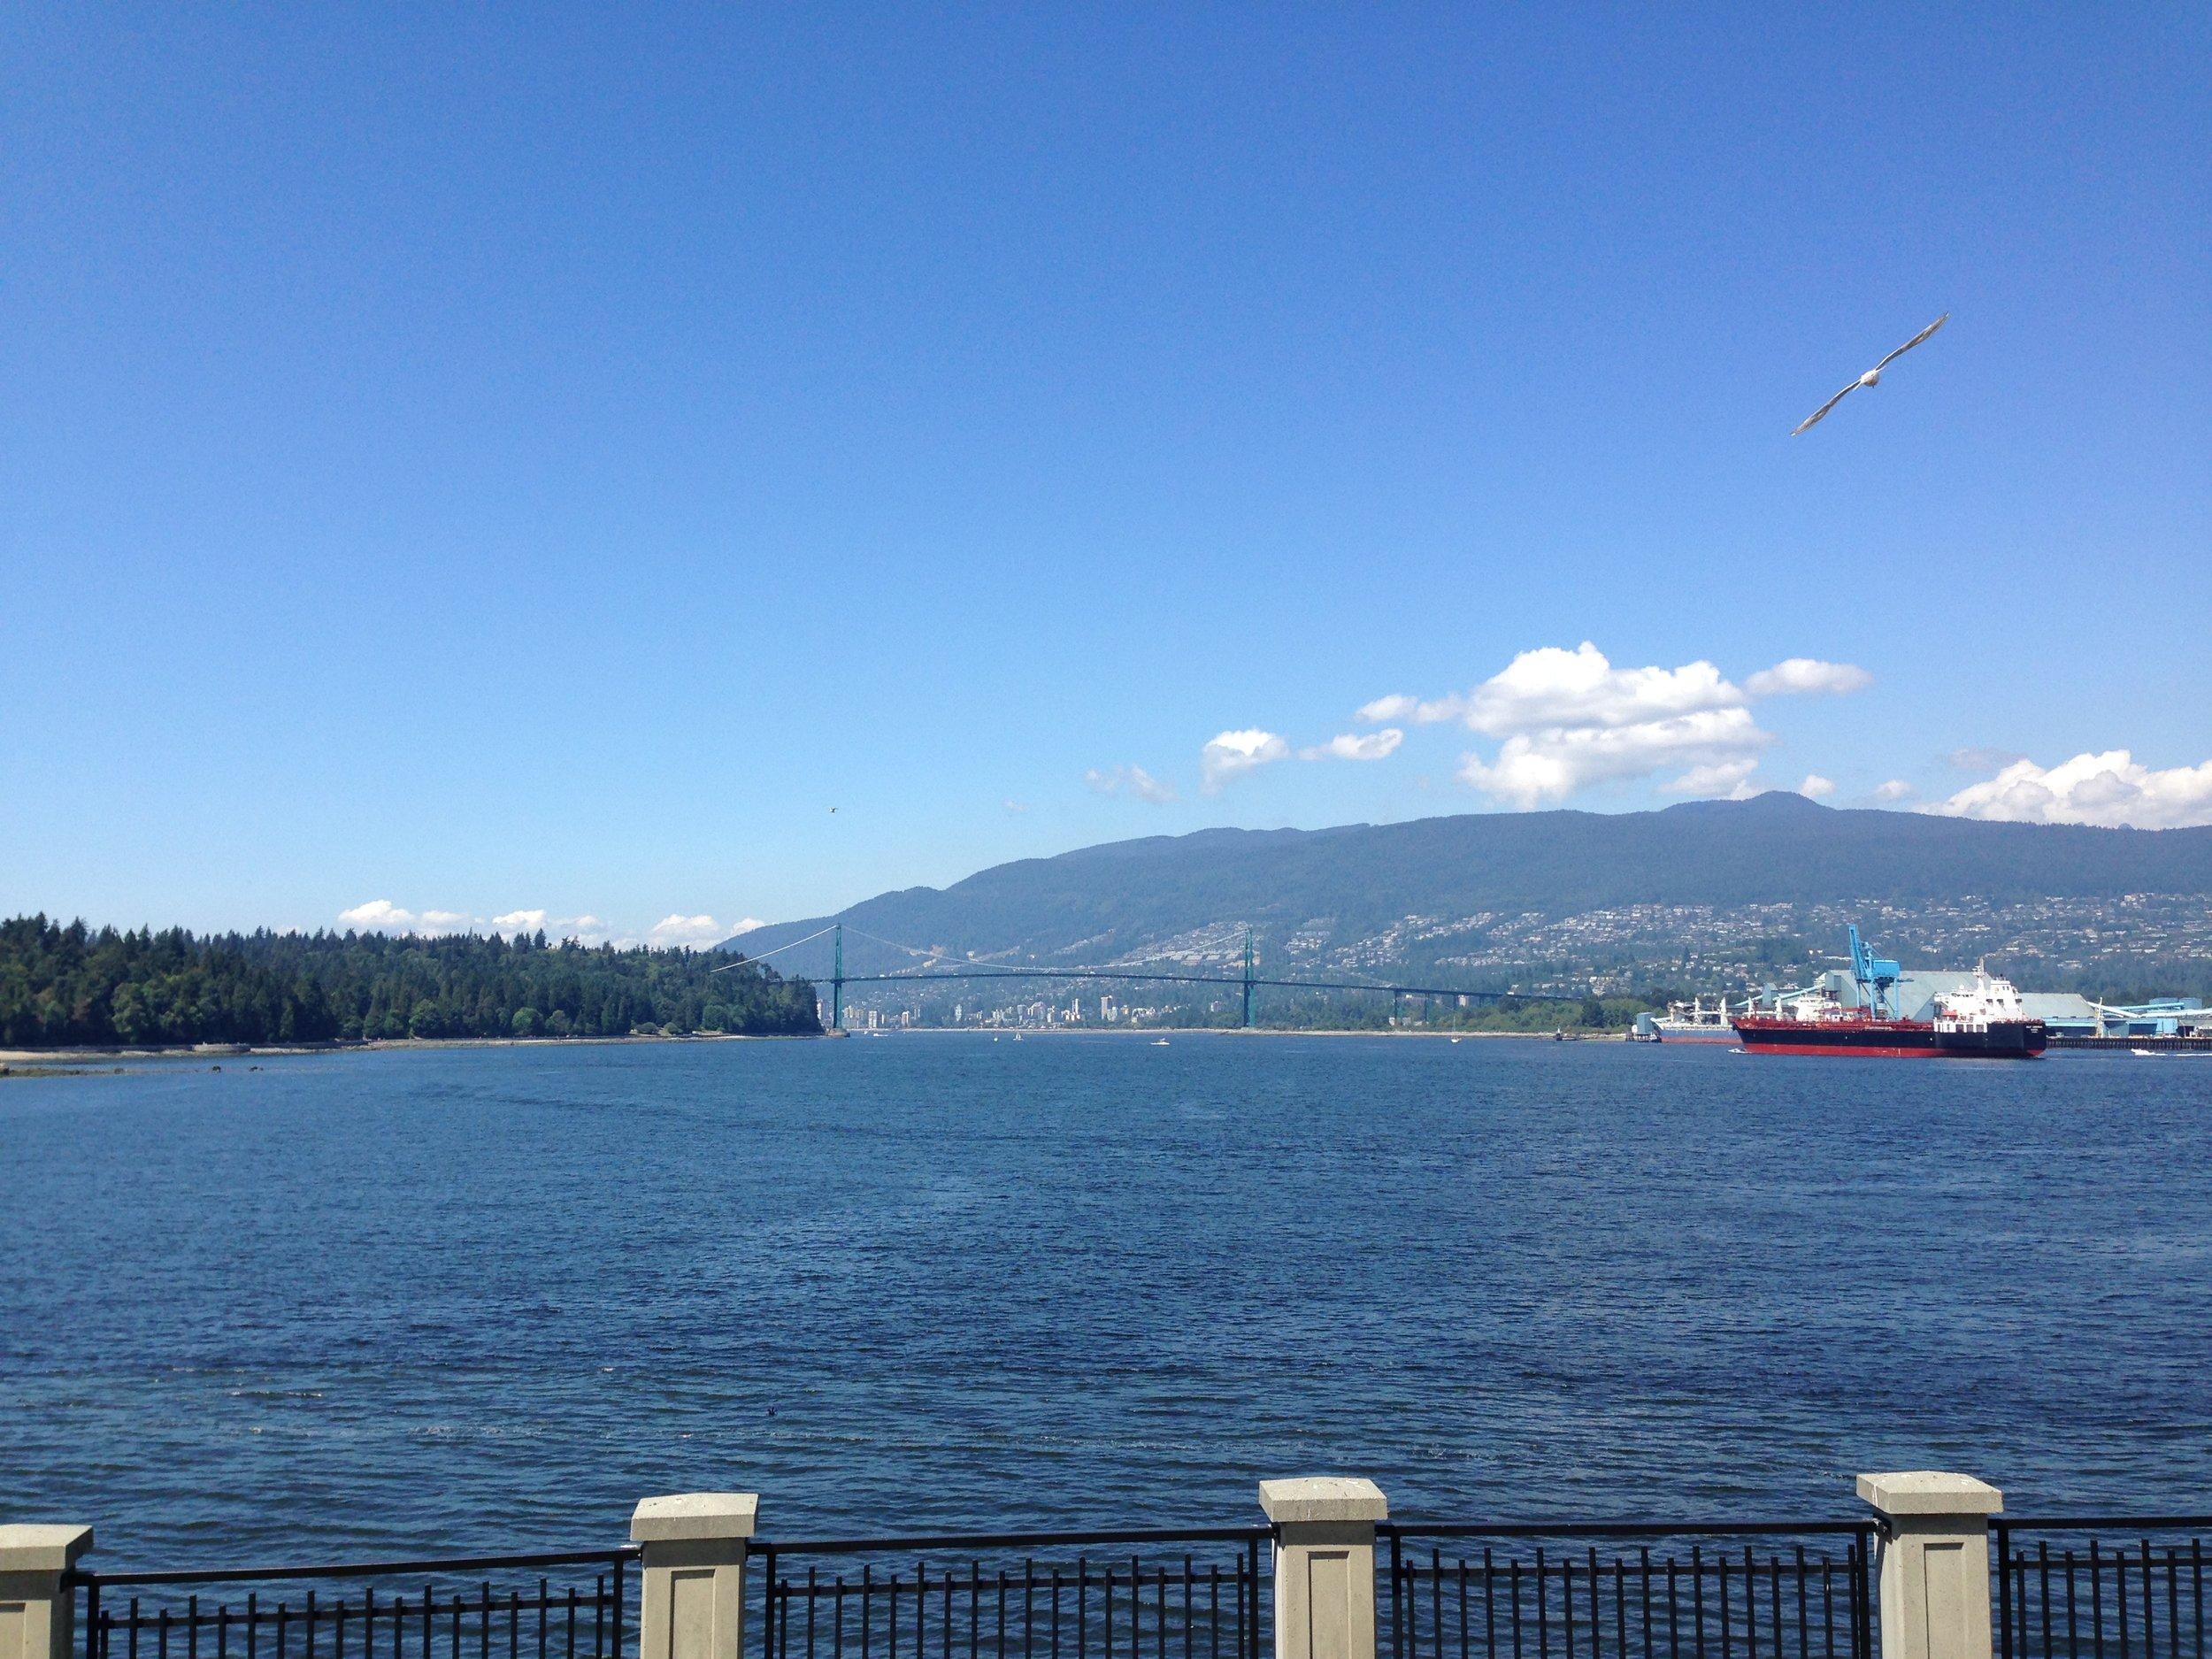 Vancouver, British Colombia